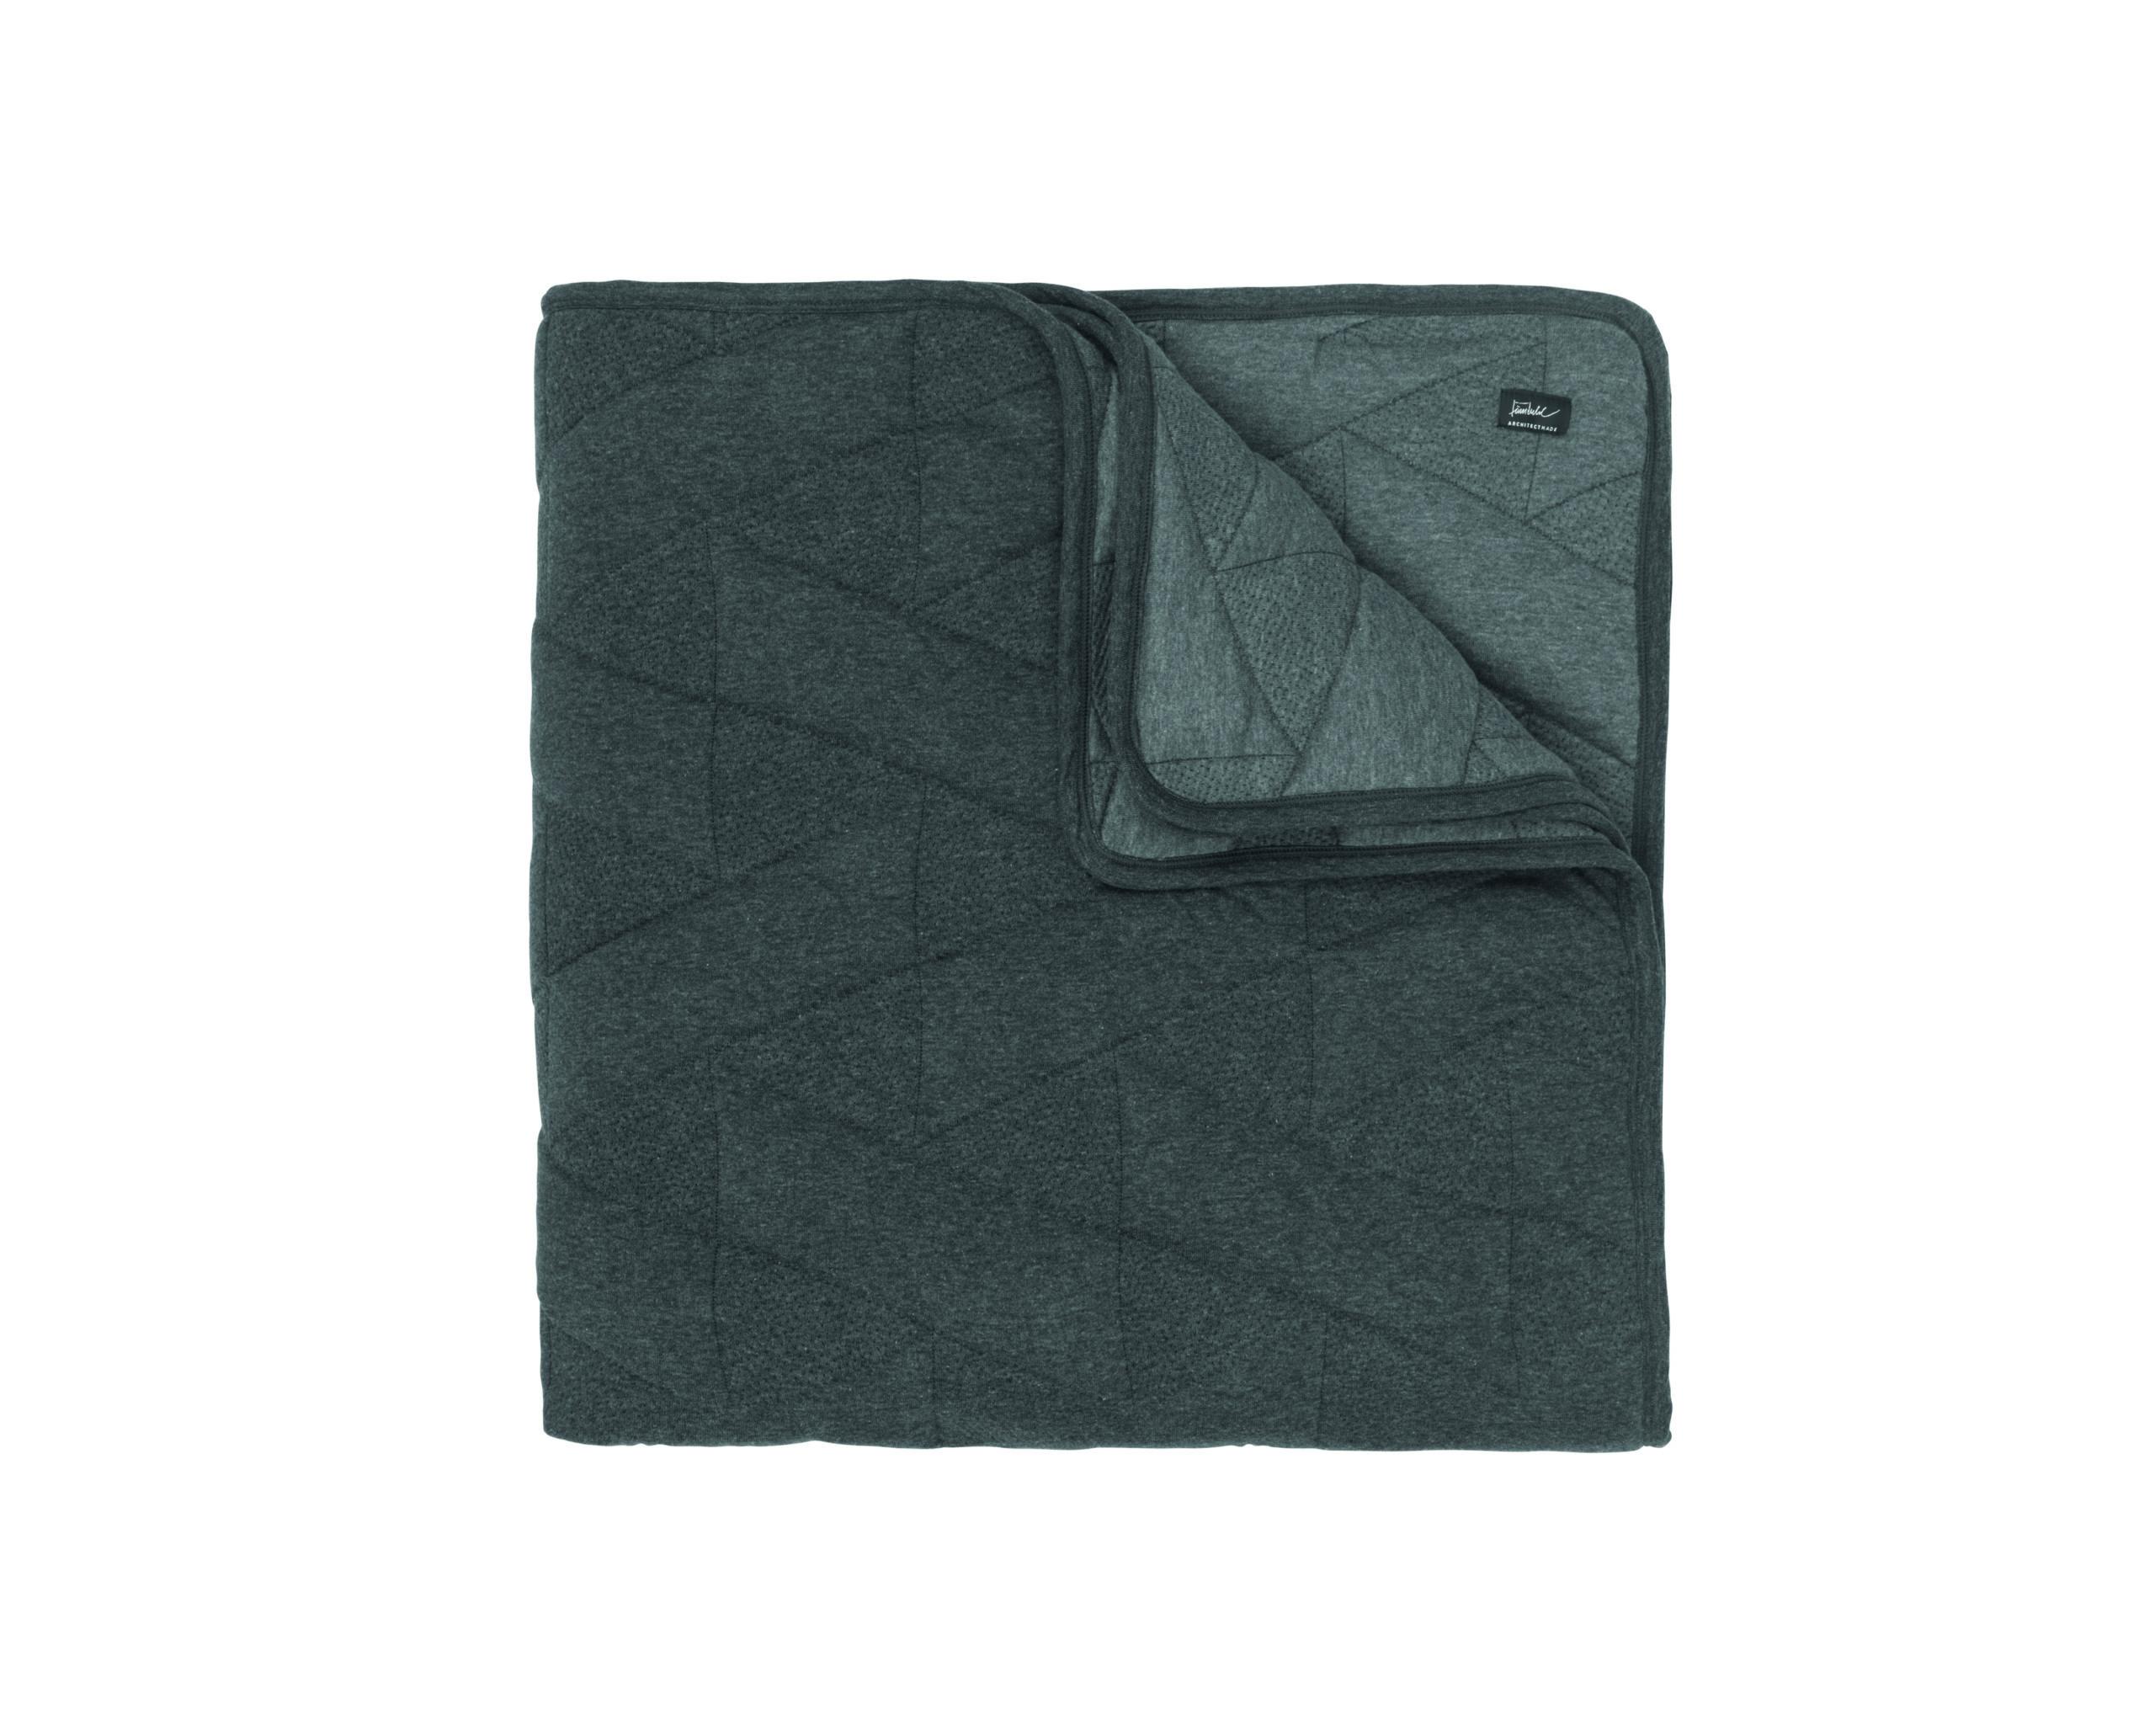 Architectmade-FJ-Pattern-Bedspread-Grey-Organic-Cotton-Finn-Juhl